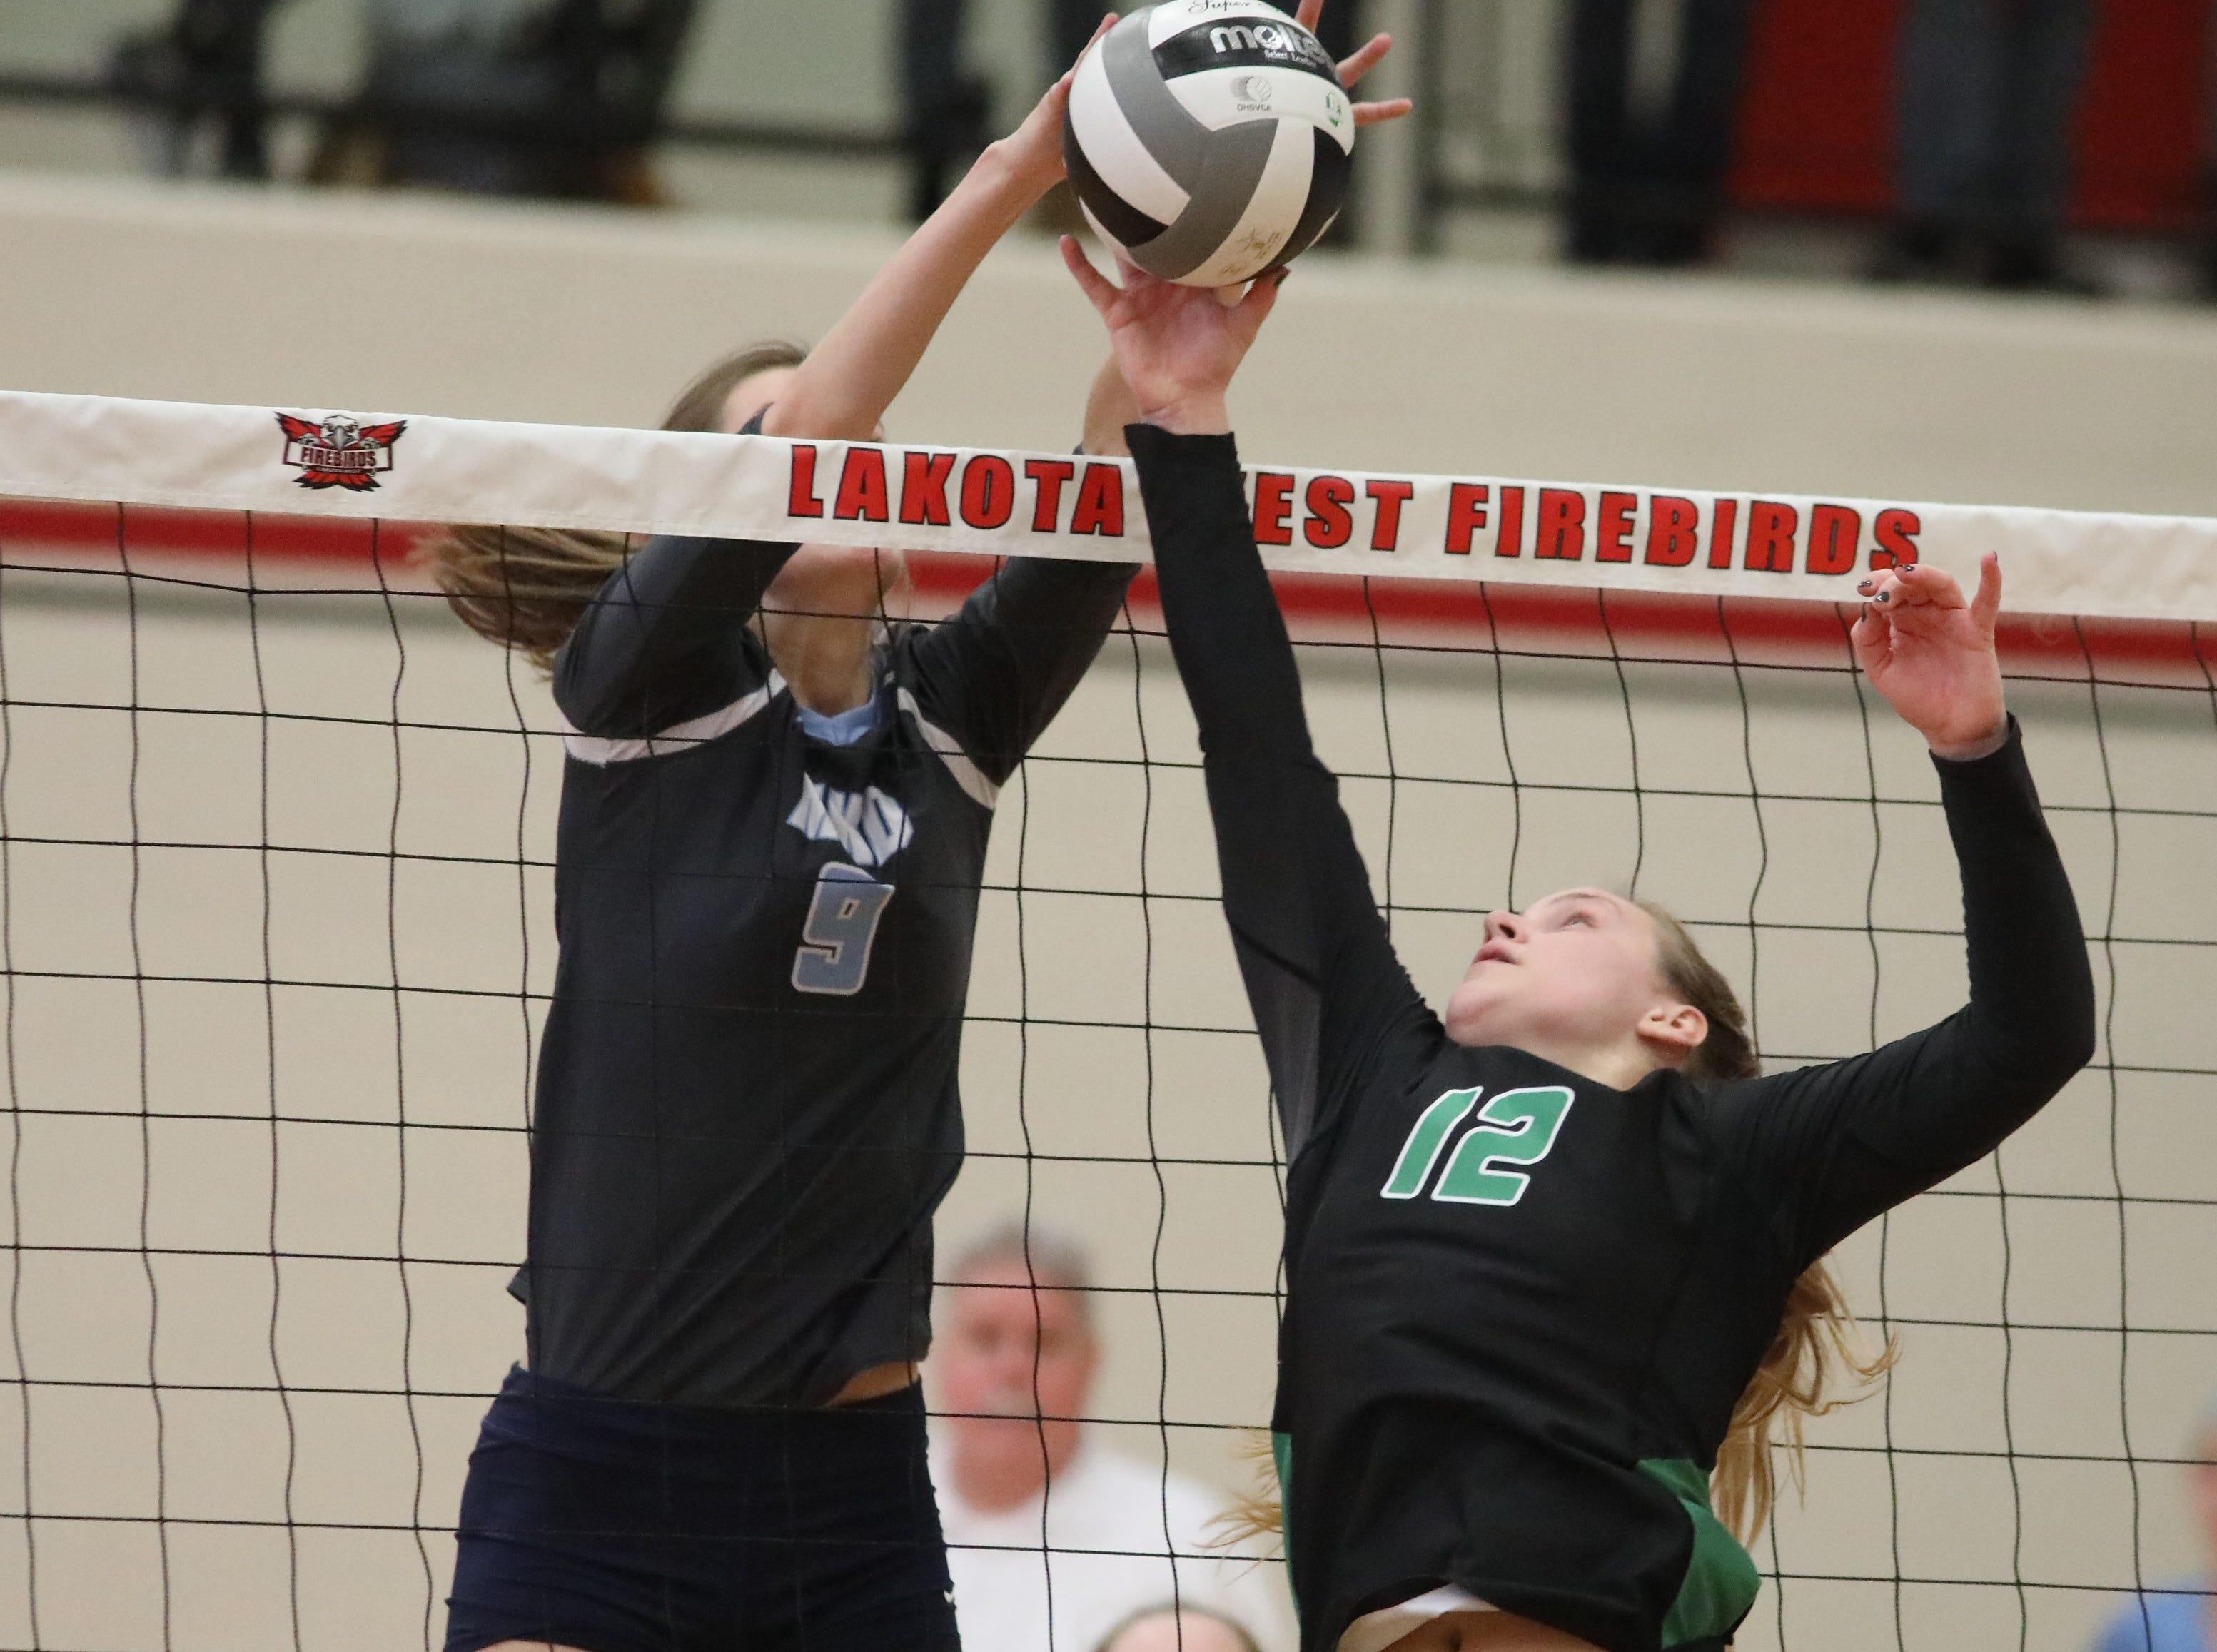 Mount Notre Dame player Carly Hendrickson (2) battles Ursuline Academy player Julia Wilkins during their regional final match, Saturday, Nov. 3, 2018.